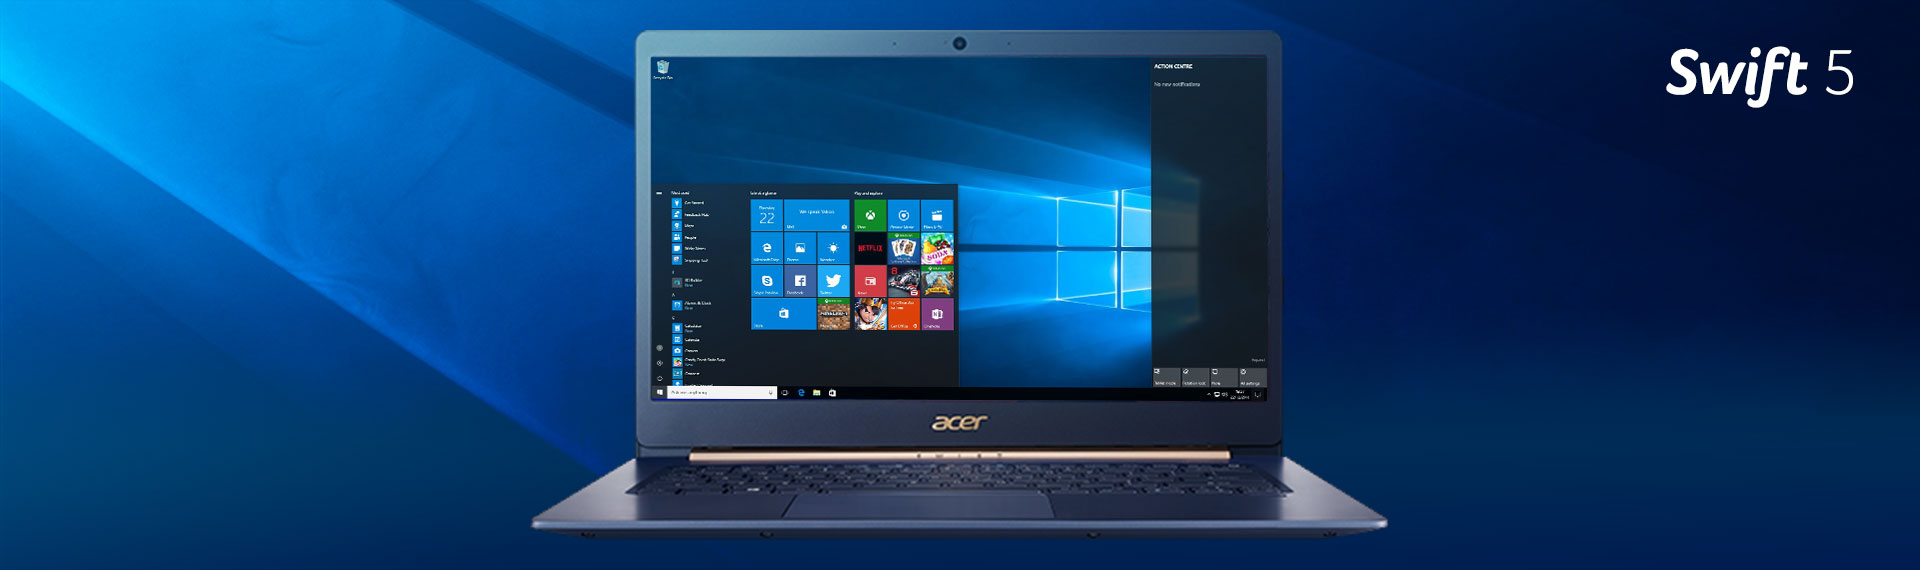 8 Cara Mempercepat Kinerja Windows 10 Agar Perangkat Nggak Lemot